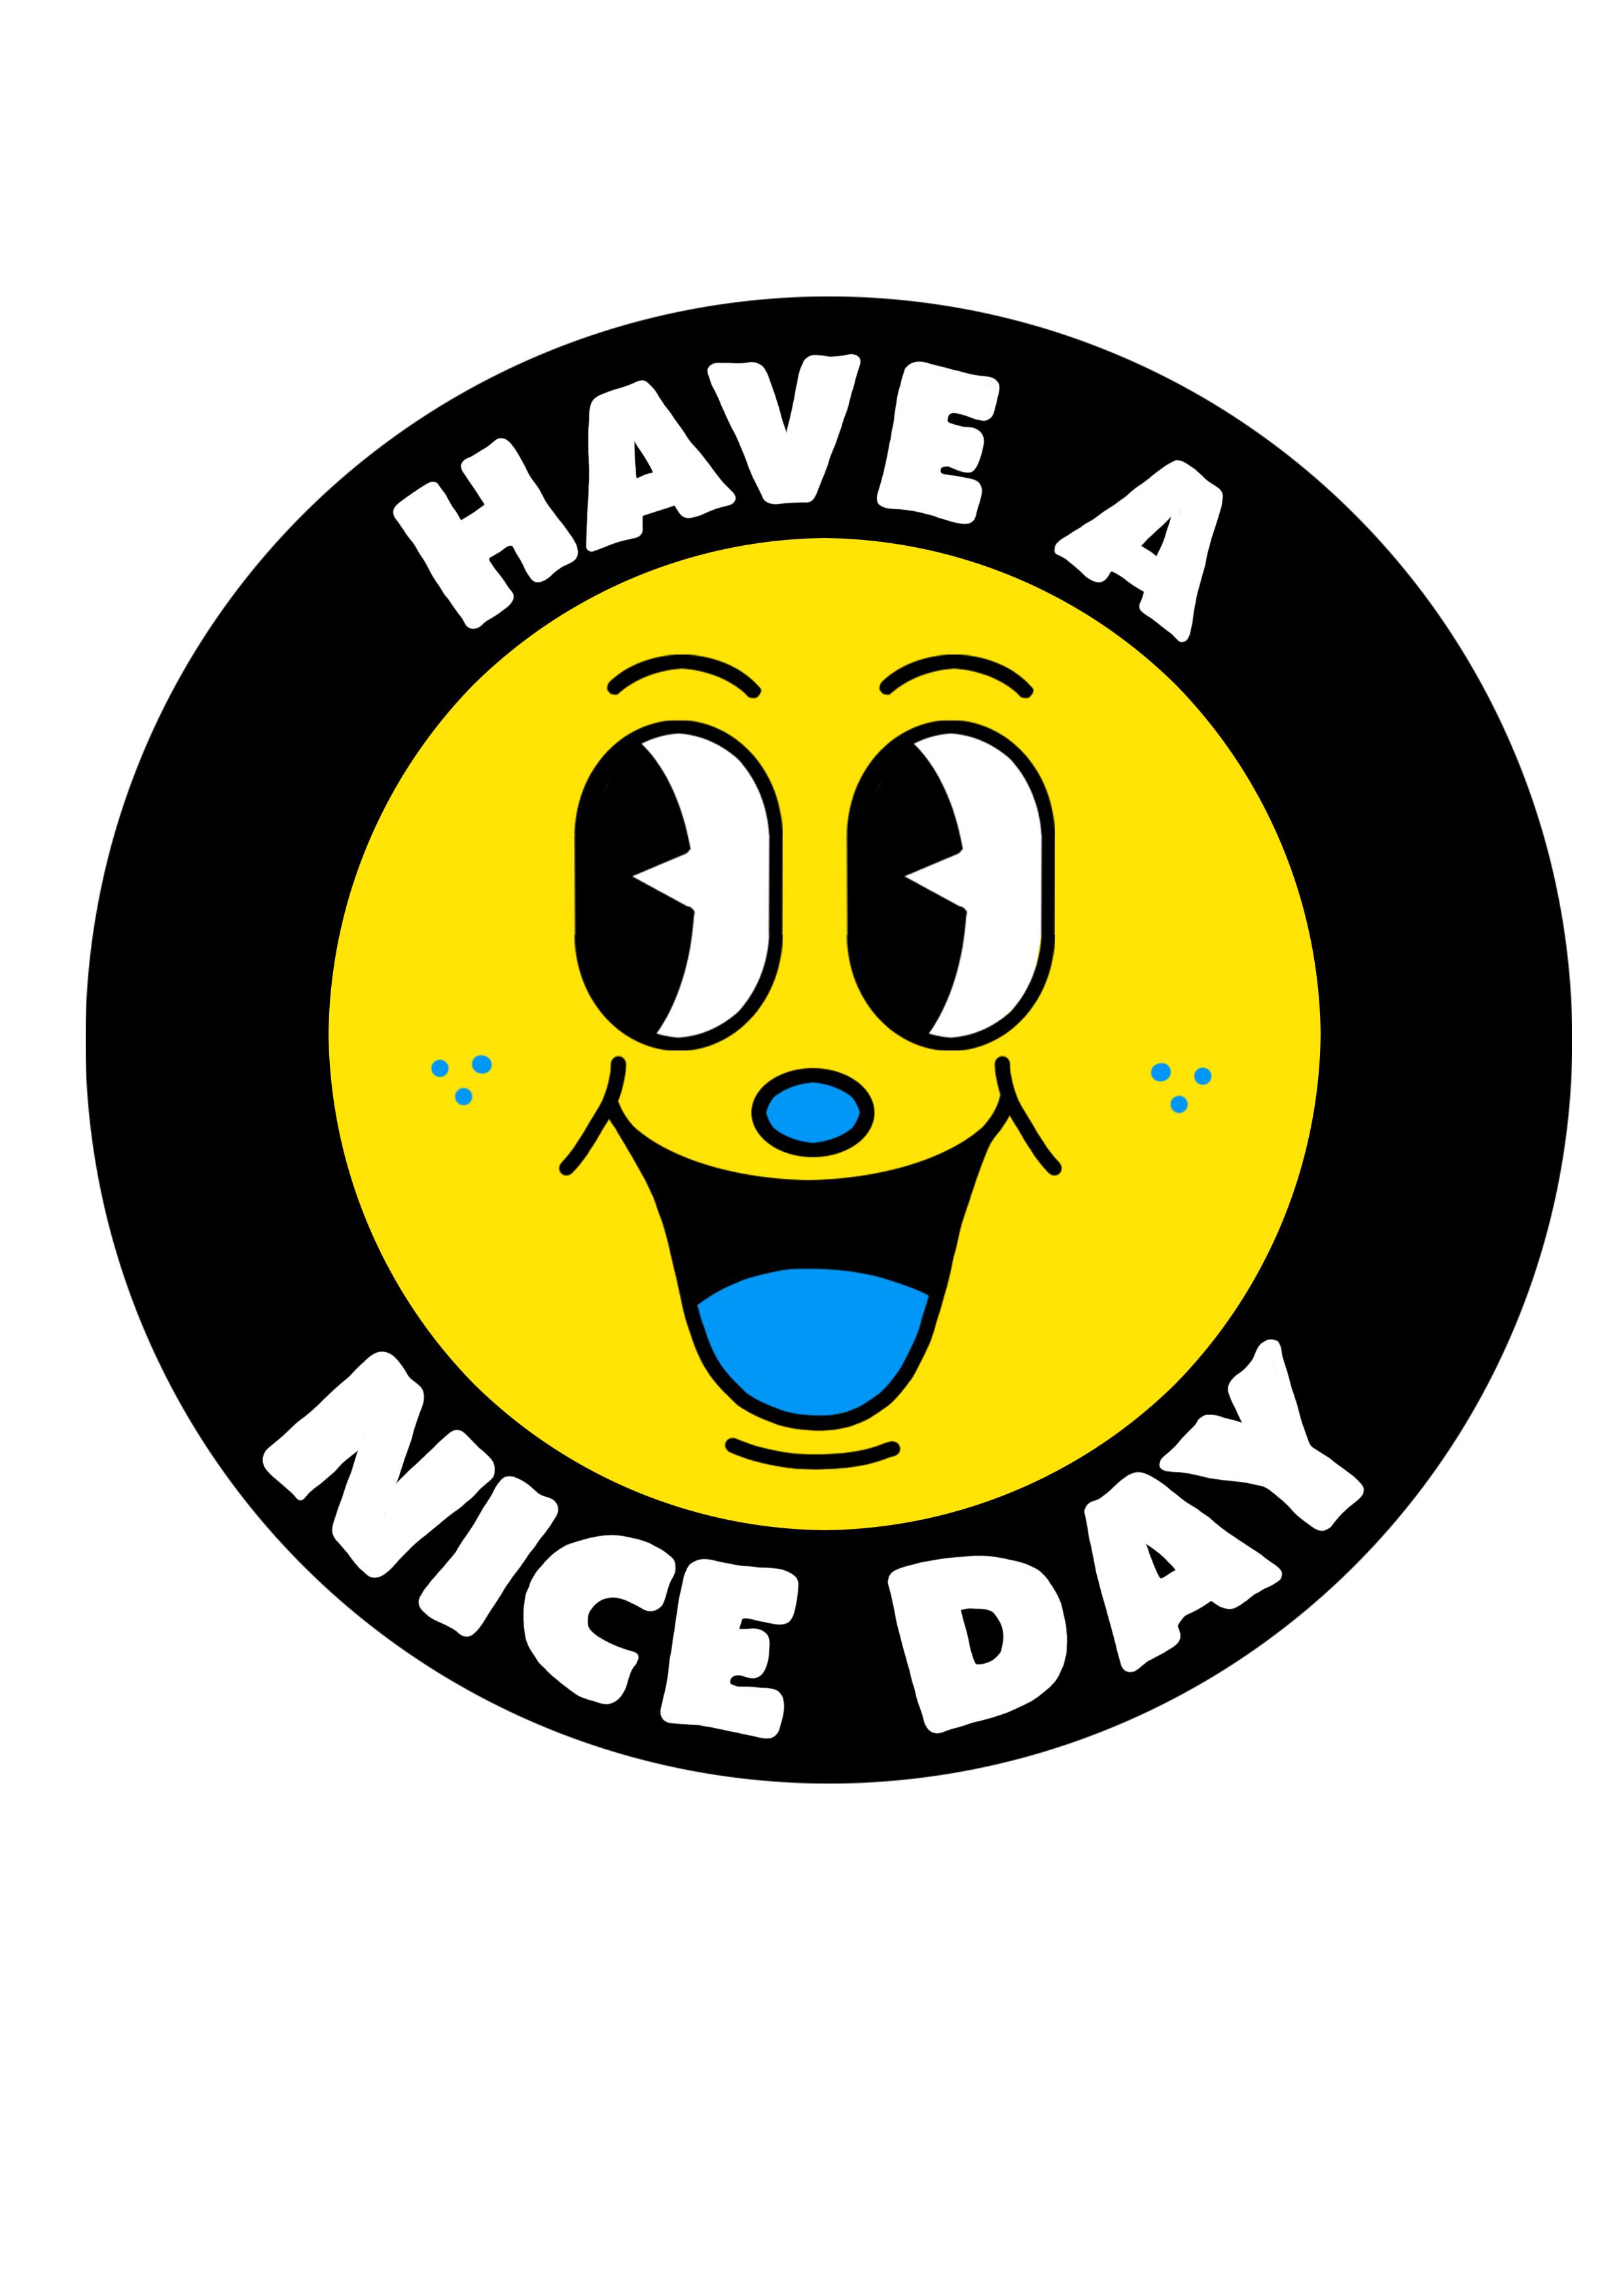 NICE DAY - PIN